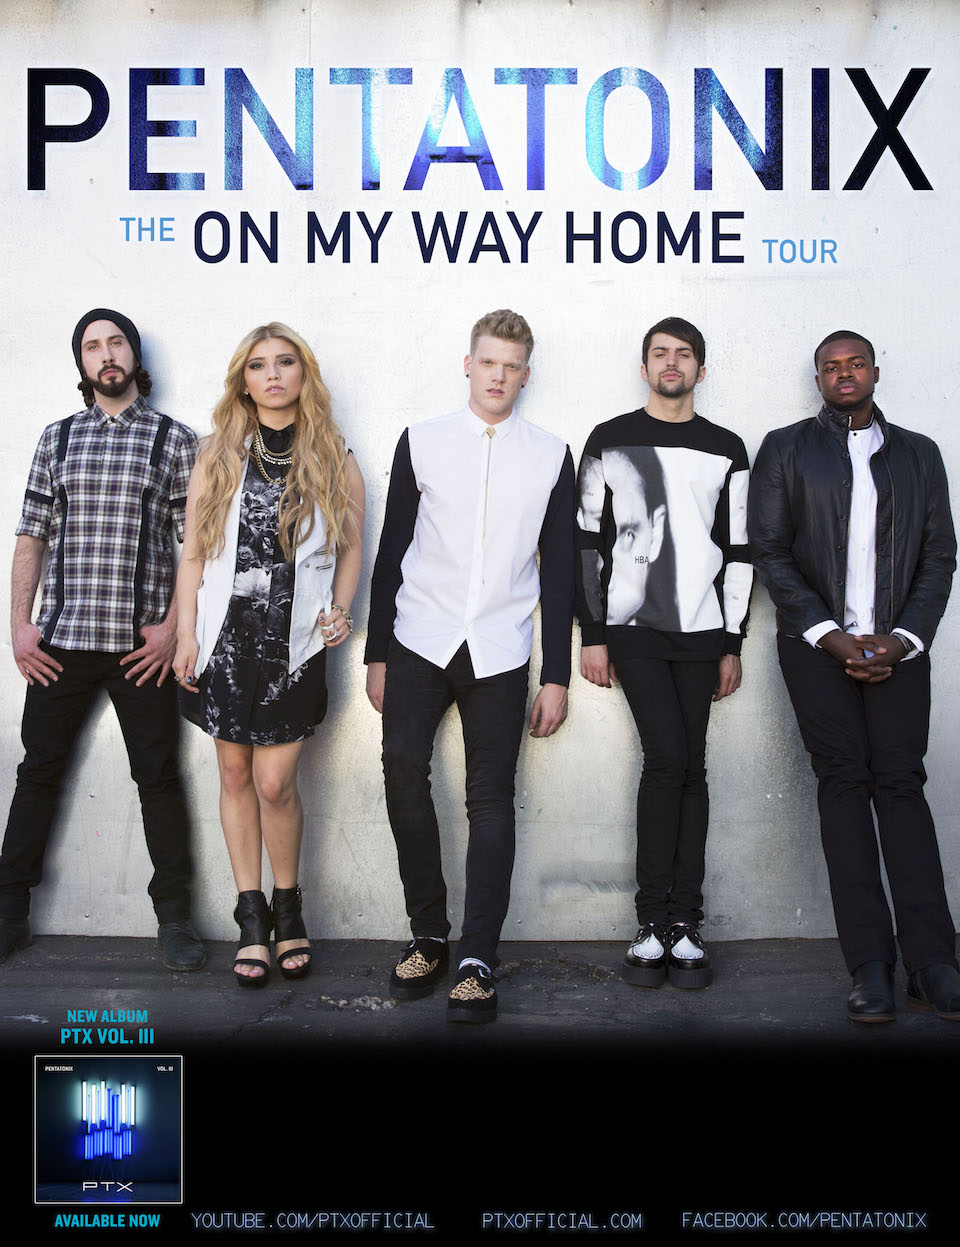 pentatonix official website 2015 tour update